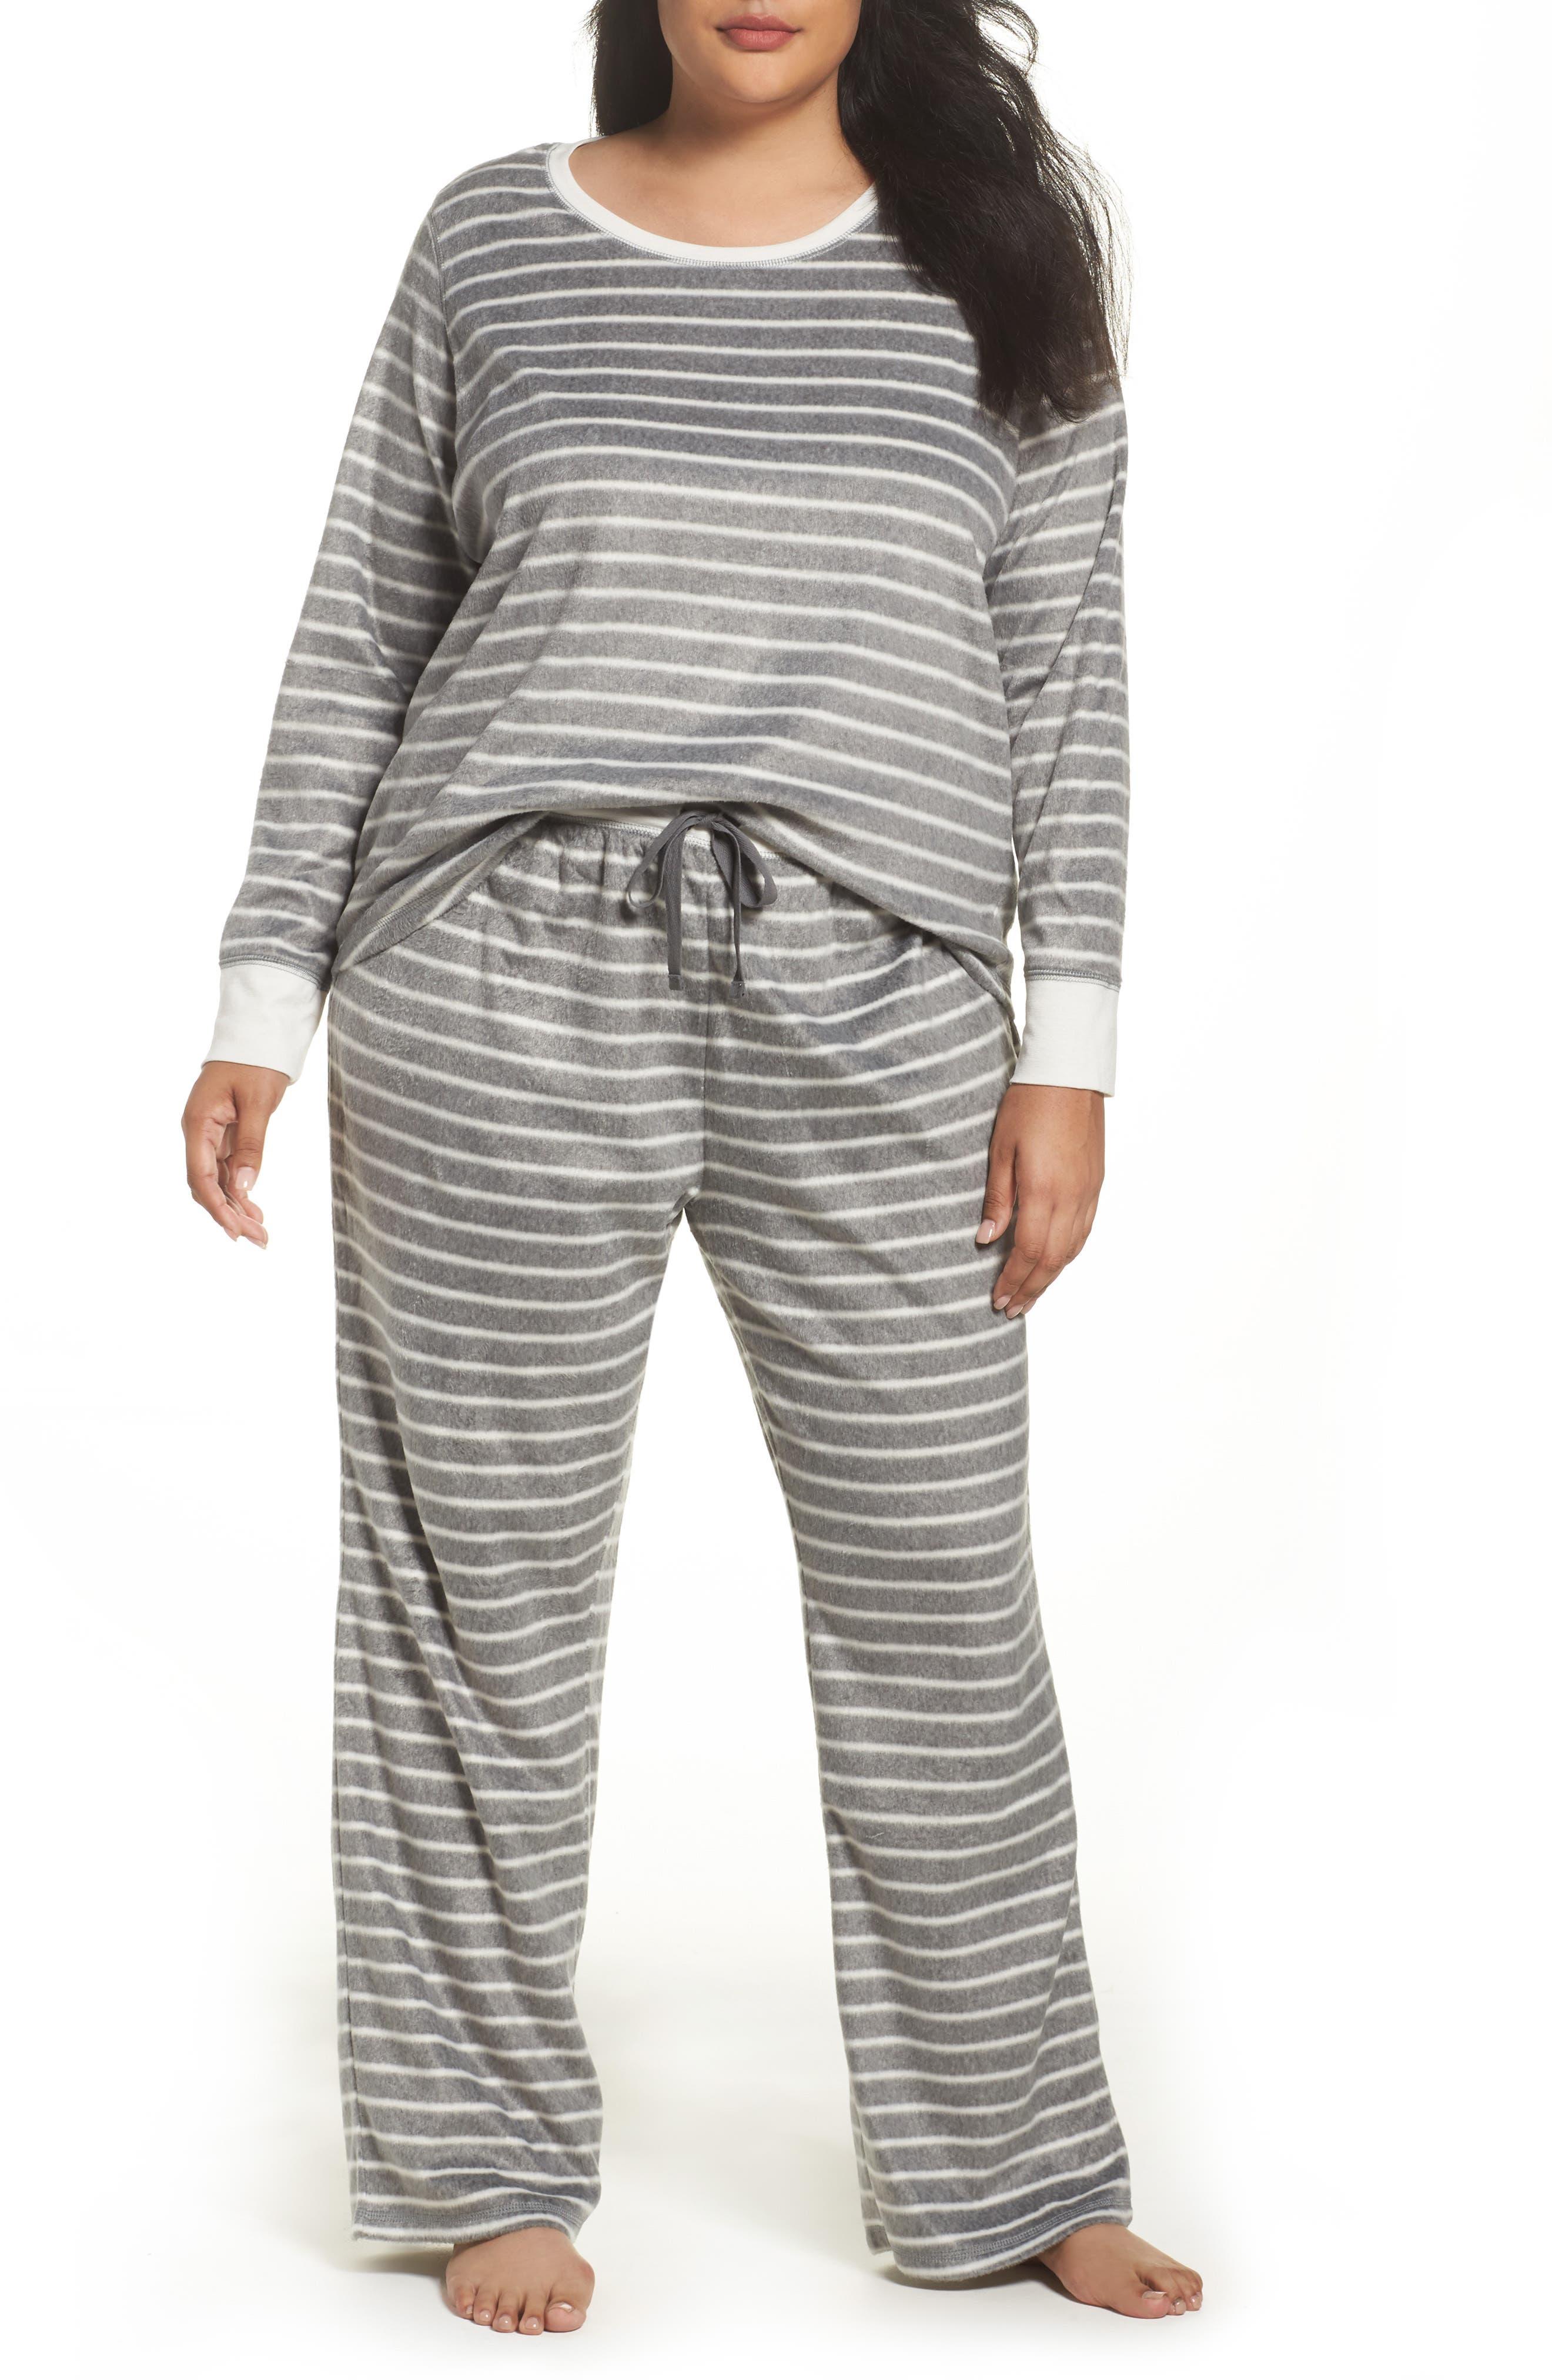 women's pajama sets plus-size pajamas & loungewear | nordstrom